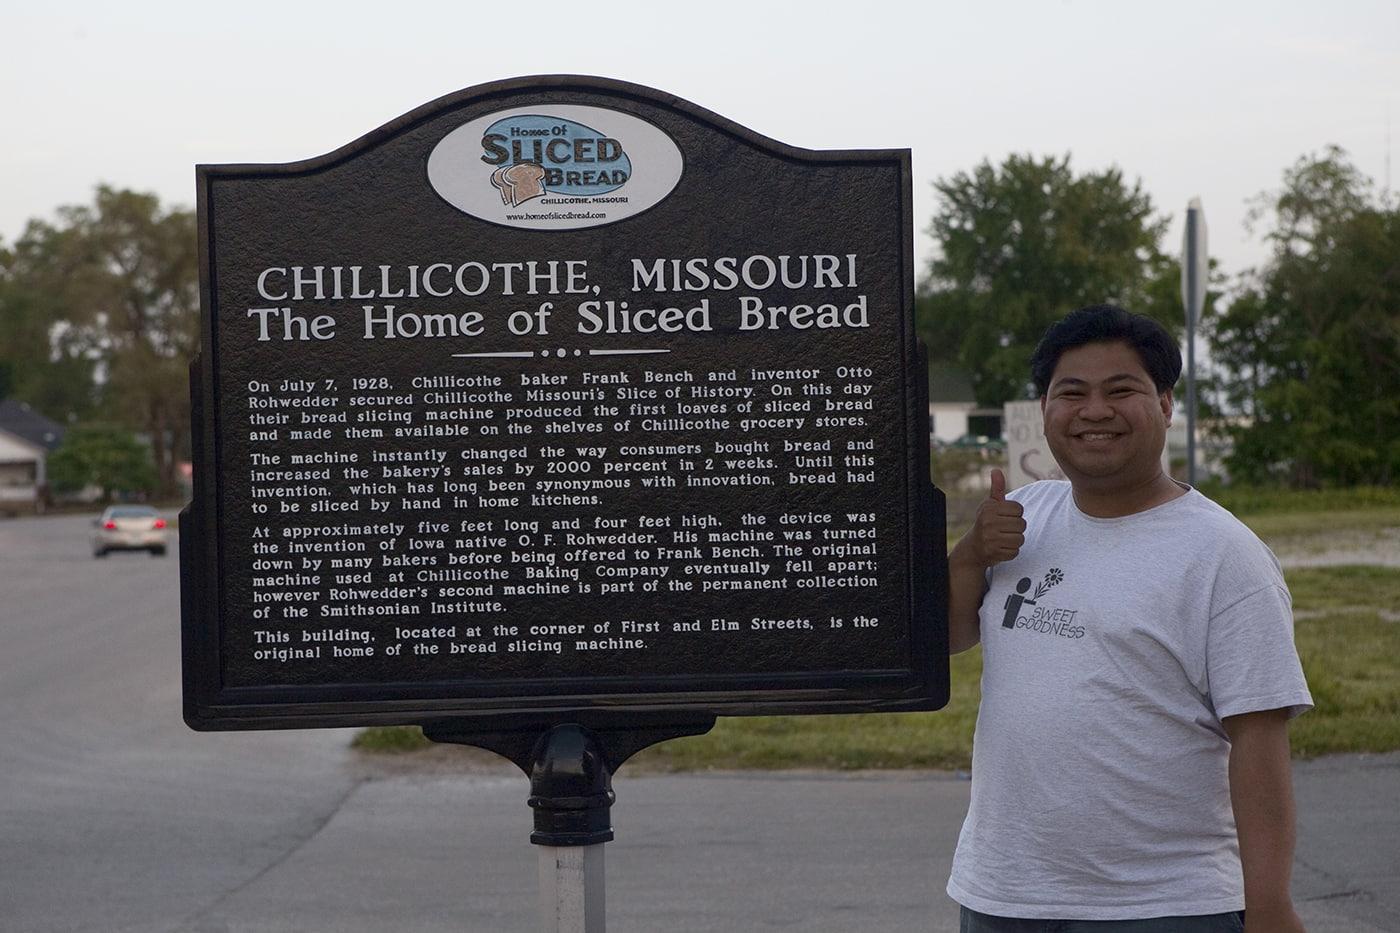 Chillicothe, Missouri - the home of sliced bread - Missouri Road Trip